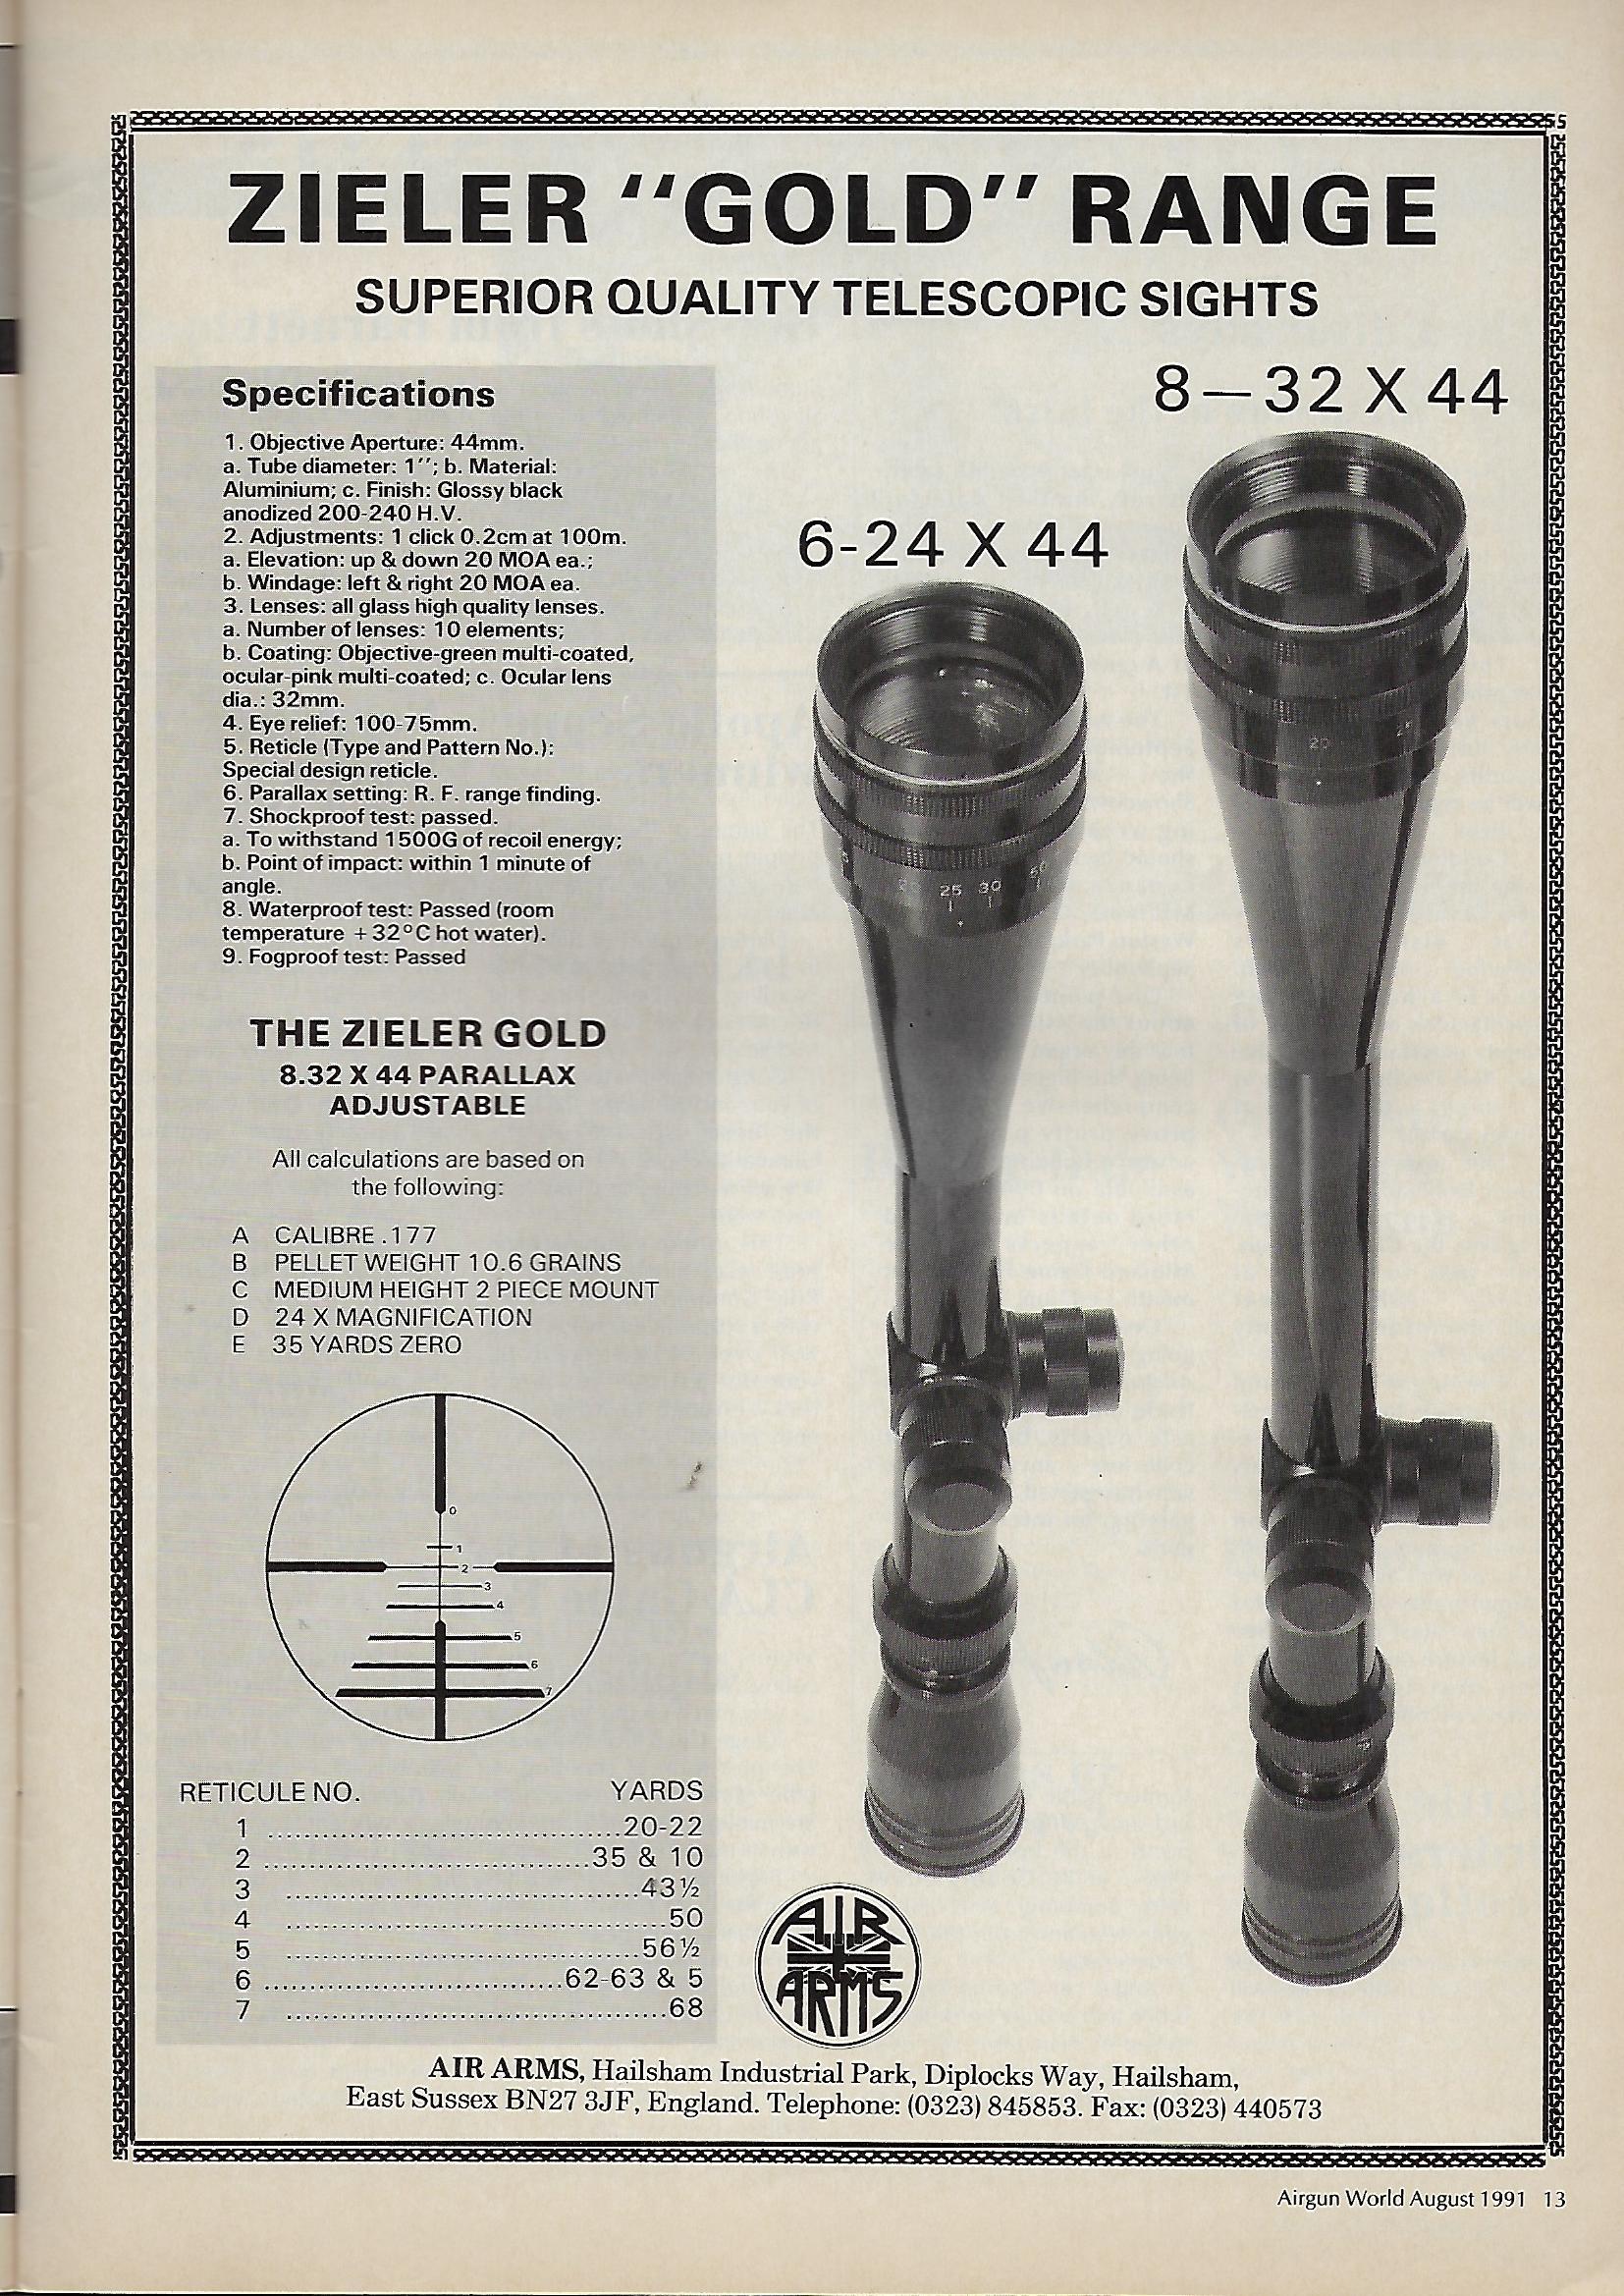 AGW - AUGUST 1991 - ZEILER AD.jpg